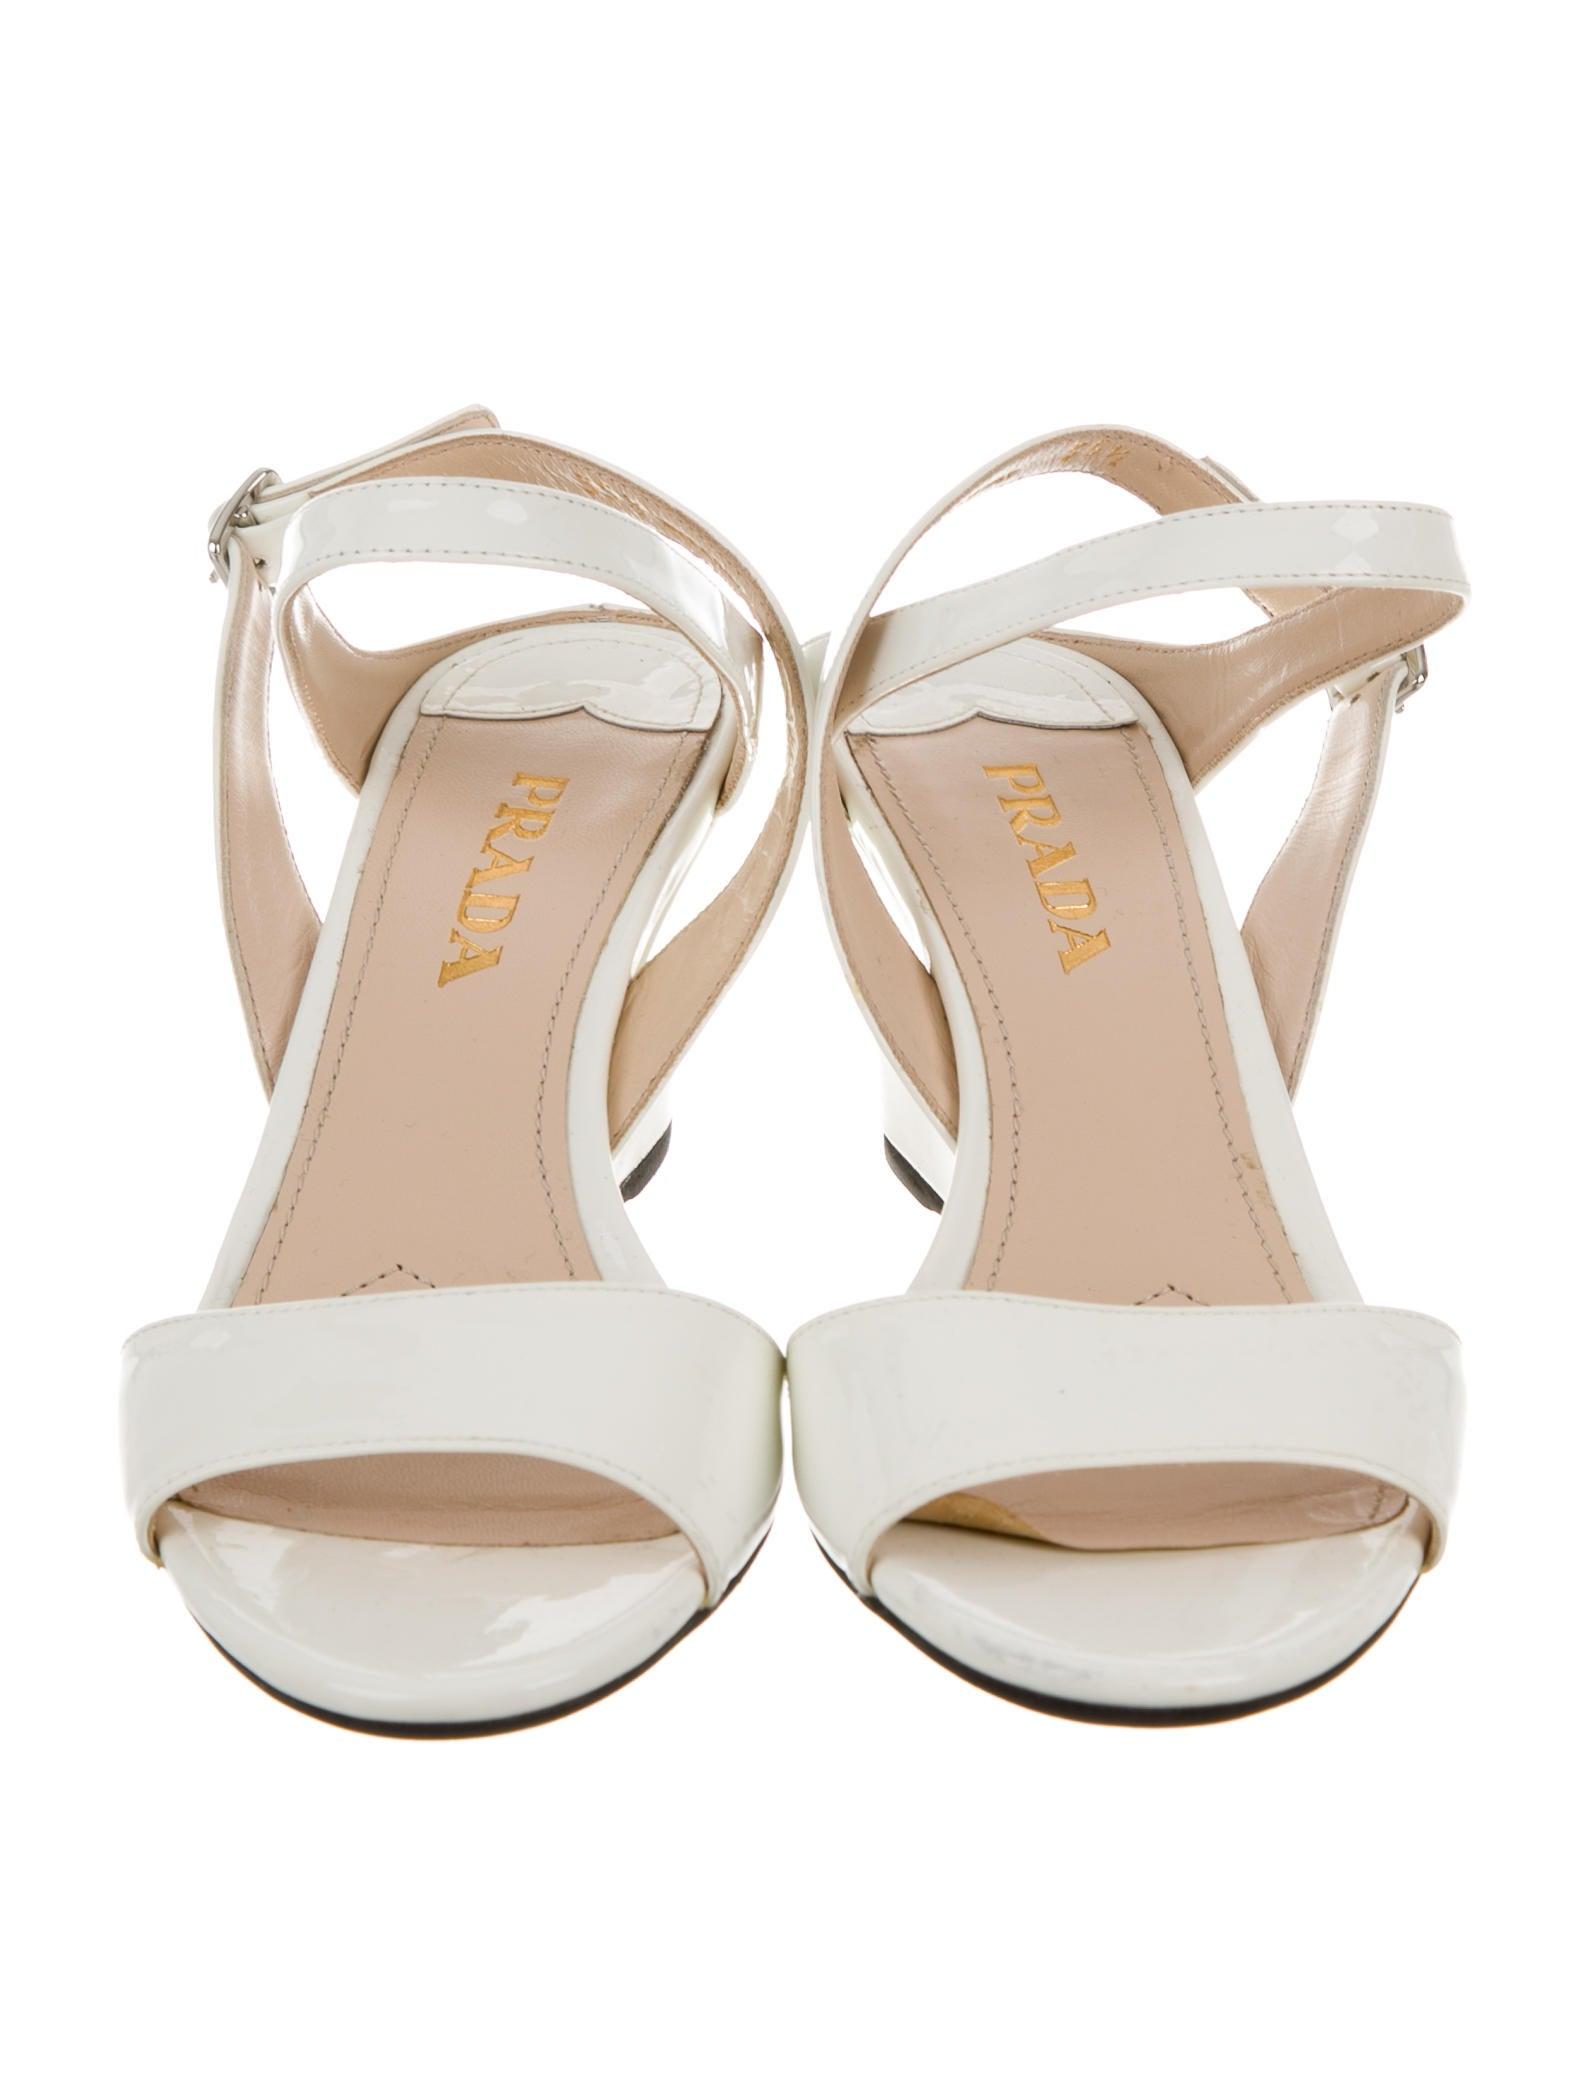 prada metallic wedge sandals shoes pra102097 the